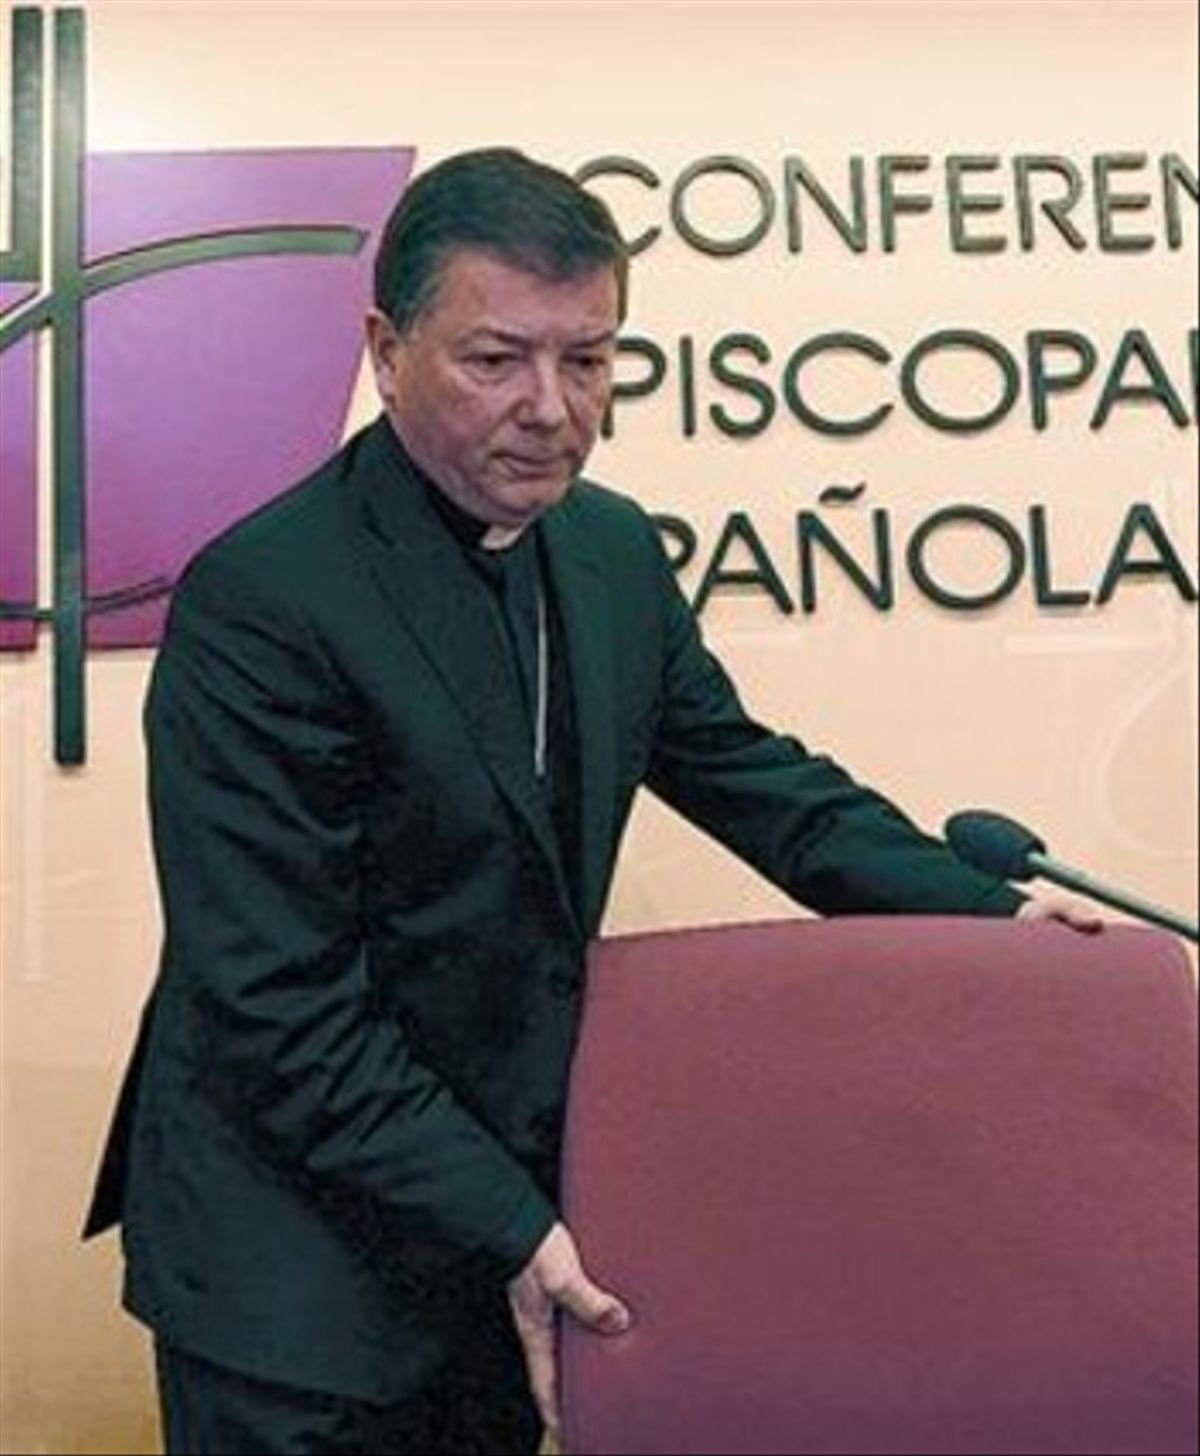 Portavoz episcopal 8 Martínez Camino, obispo auxiliar de Madrid, ayer.